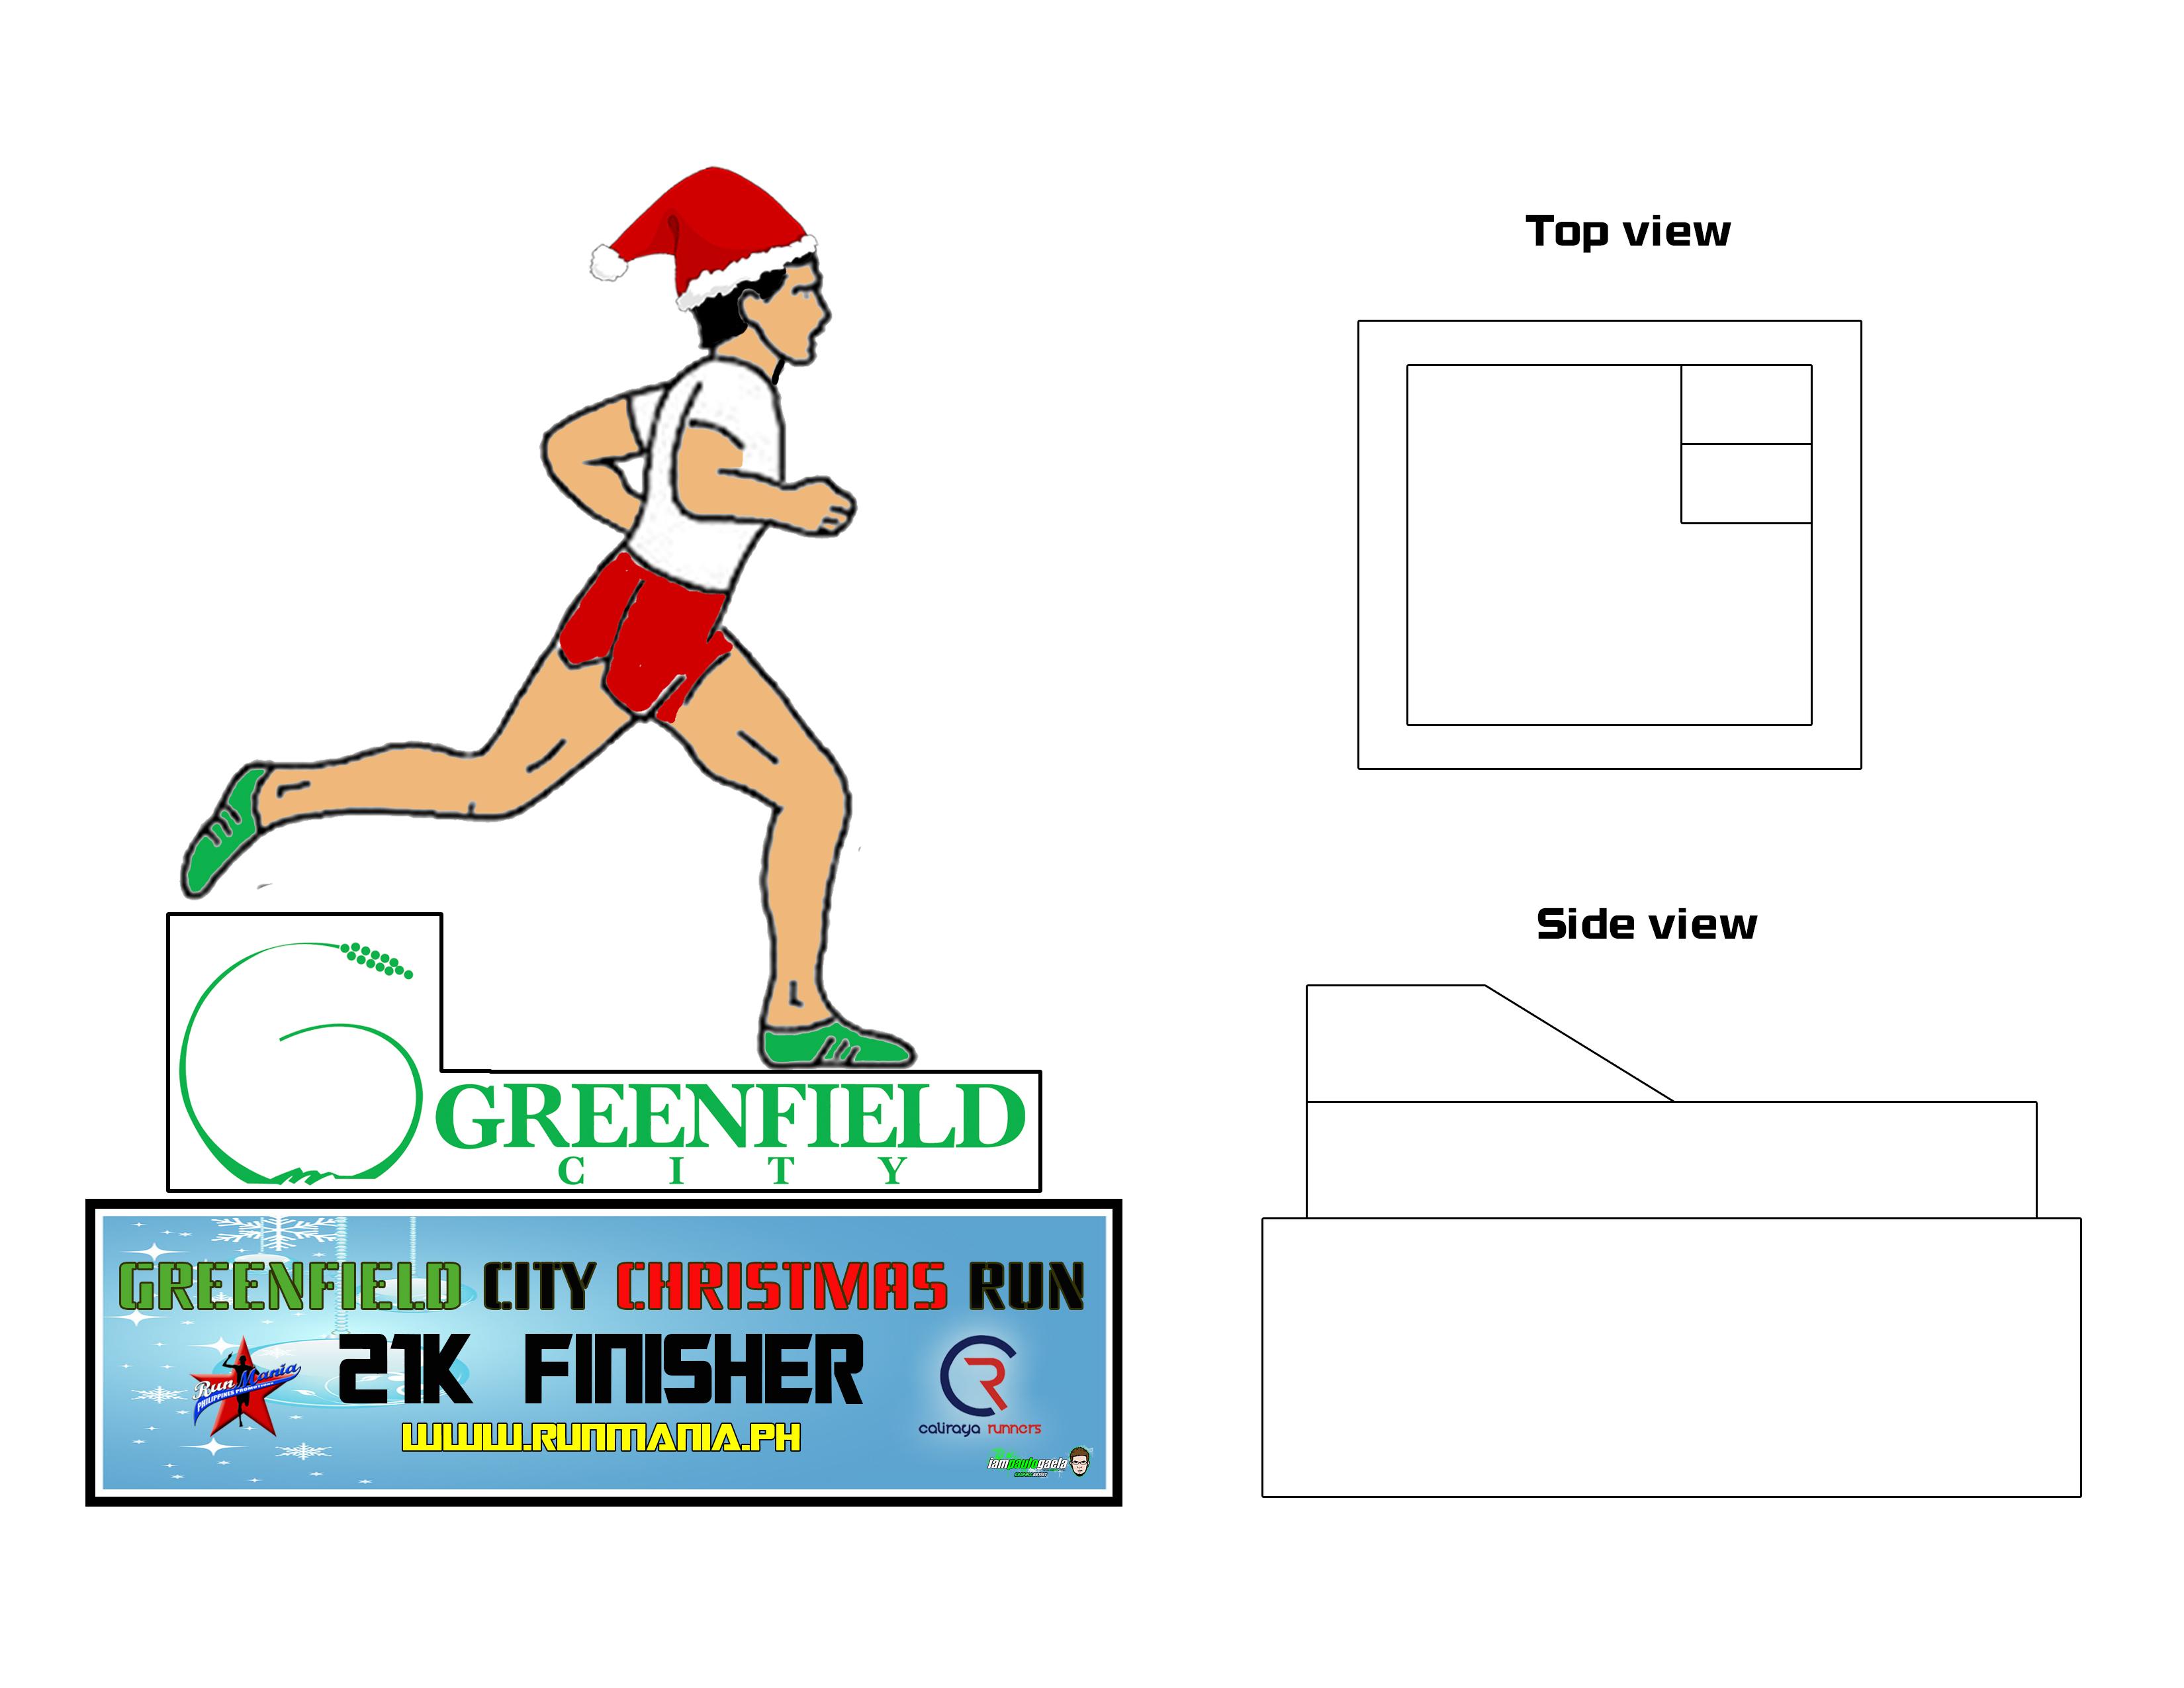 greenfield-city-christmas-run-2013-trophy-design